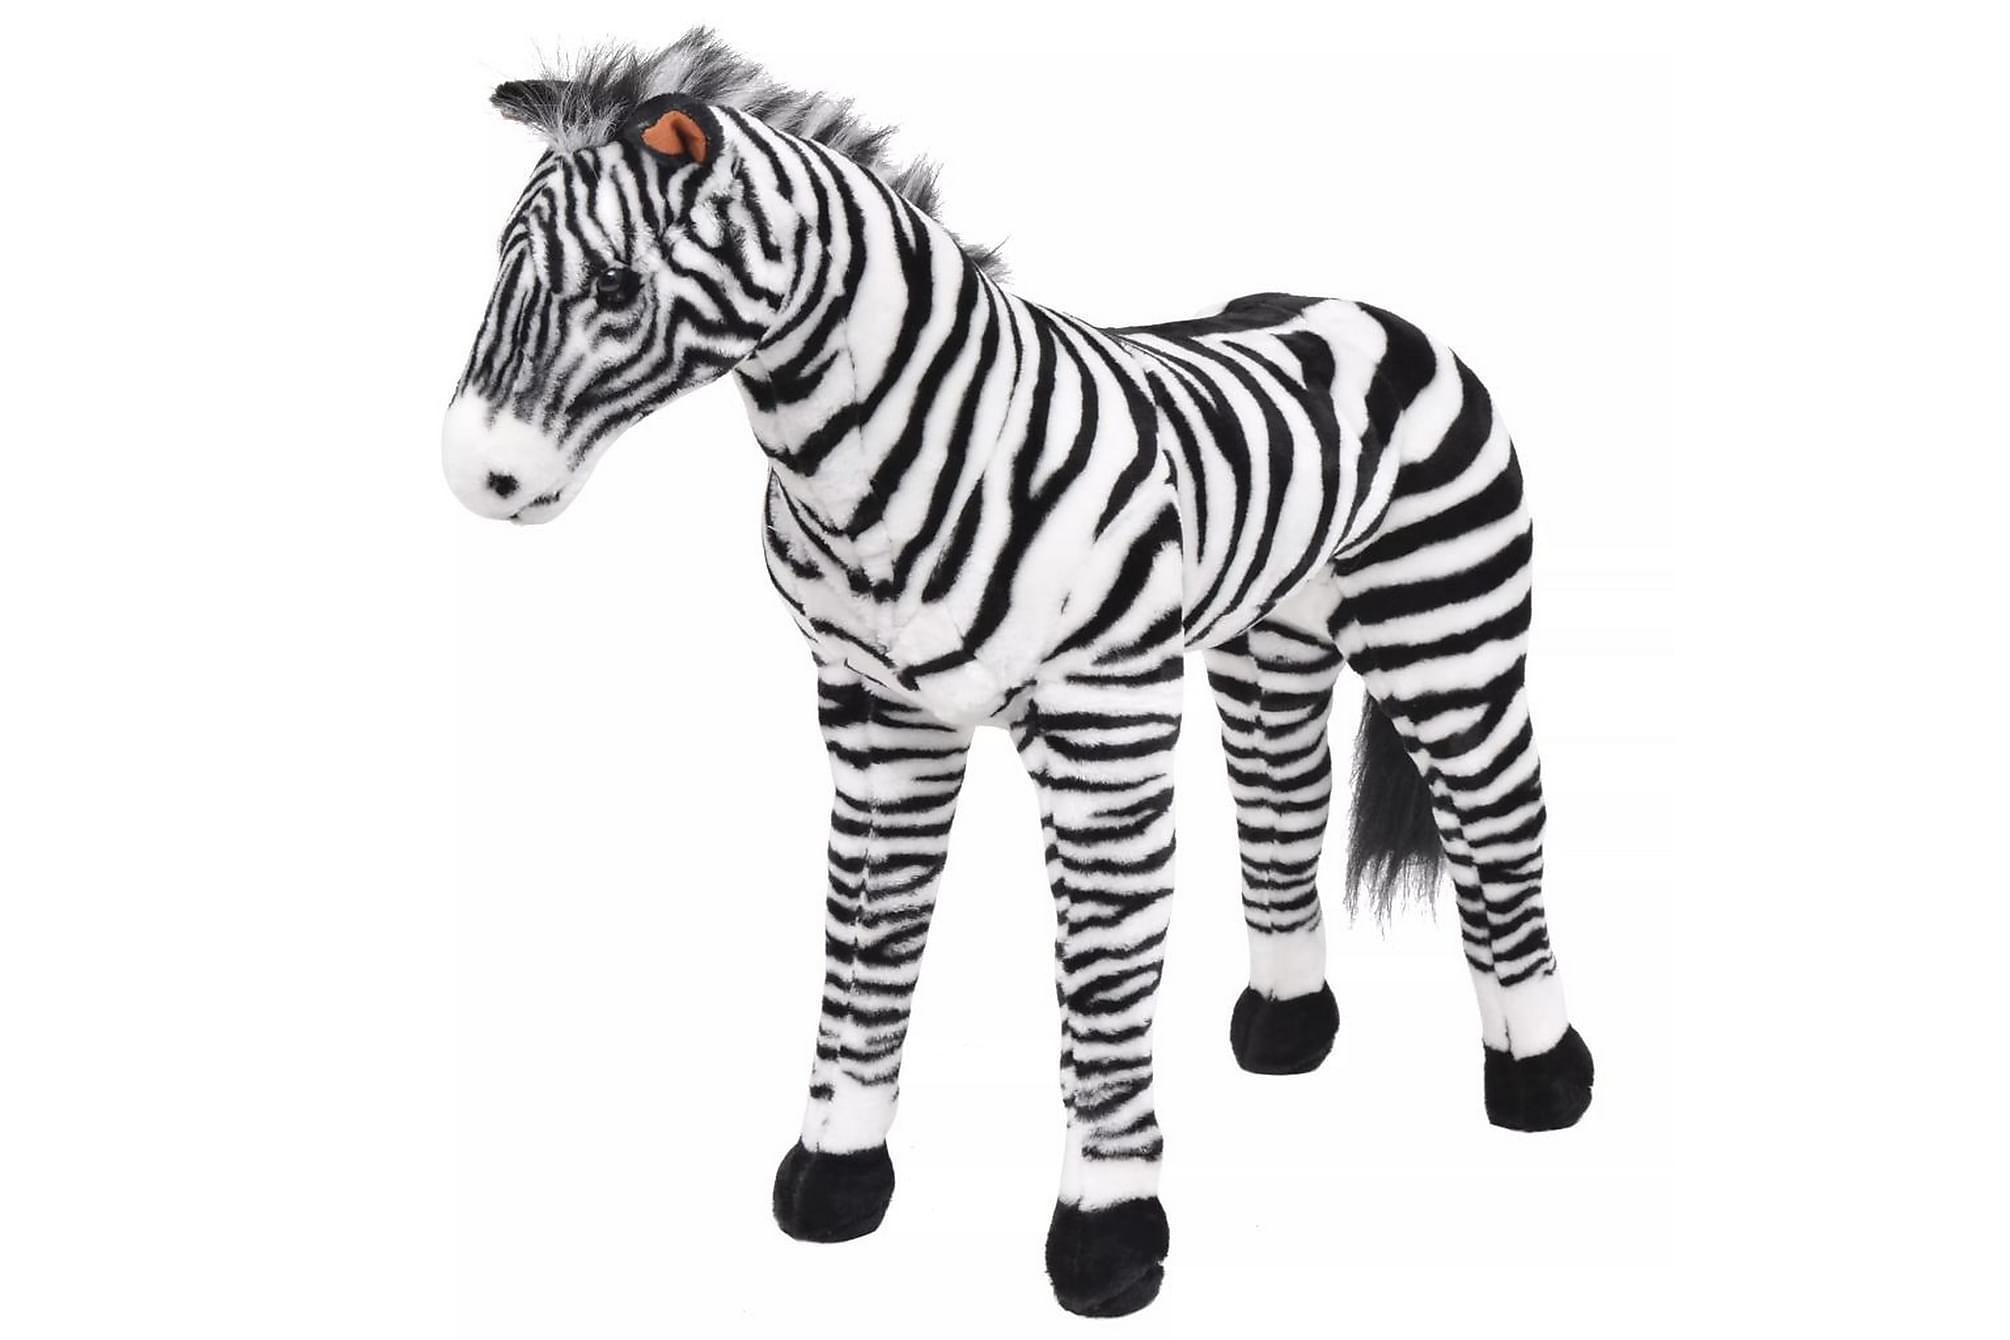 Stående leksakszebra plysch svart och vit XXL